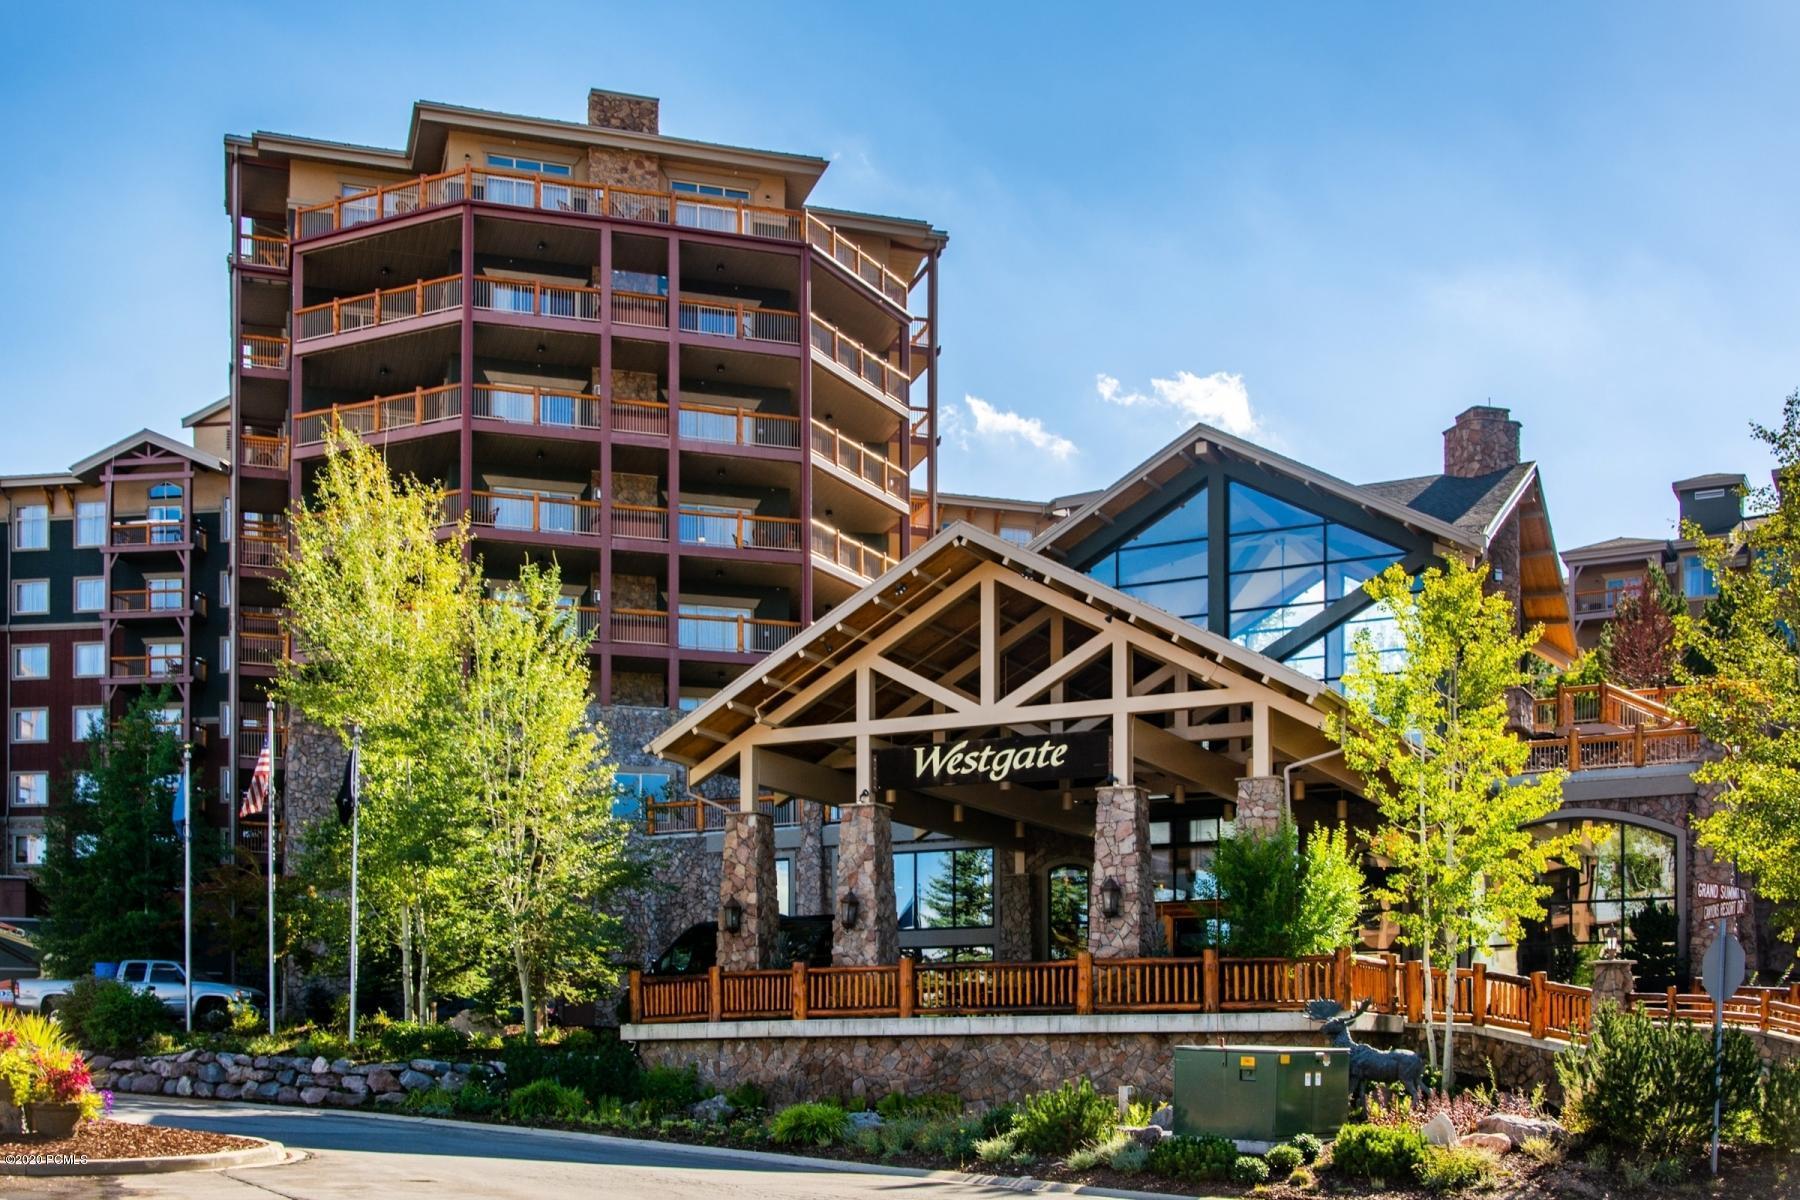 3000 Canyons Resort Drive, Park City, Utah 84098, 1 Bedroom Bedrooms, ,1 BathroomBathrooms,Condominium,For Sale,Canyons Resort,20190109112430415765000000